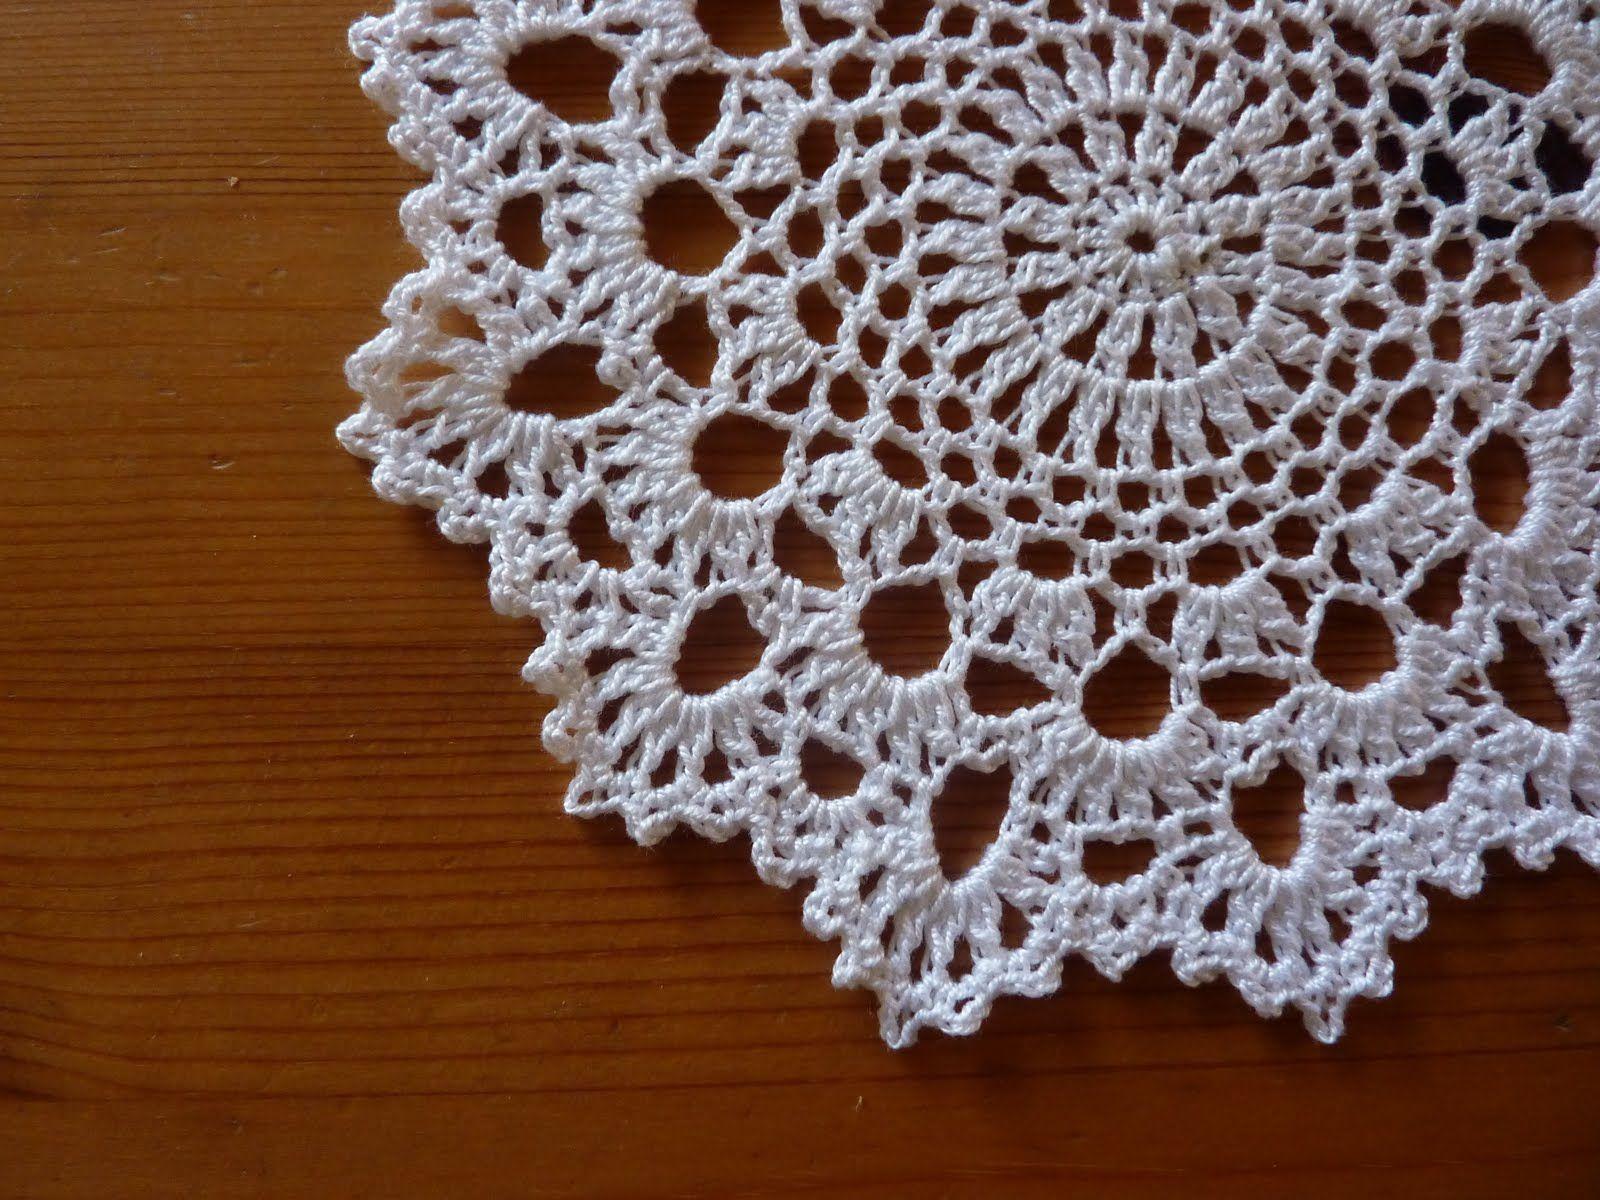 Easy crochet doily for beginners very pretty and so easy to make easy crochet doily for beginners very pretty and so easy to make doilies are dt1010fo